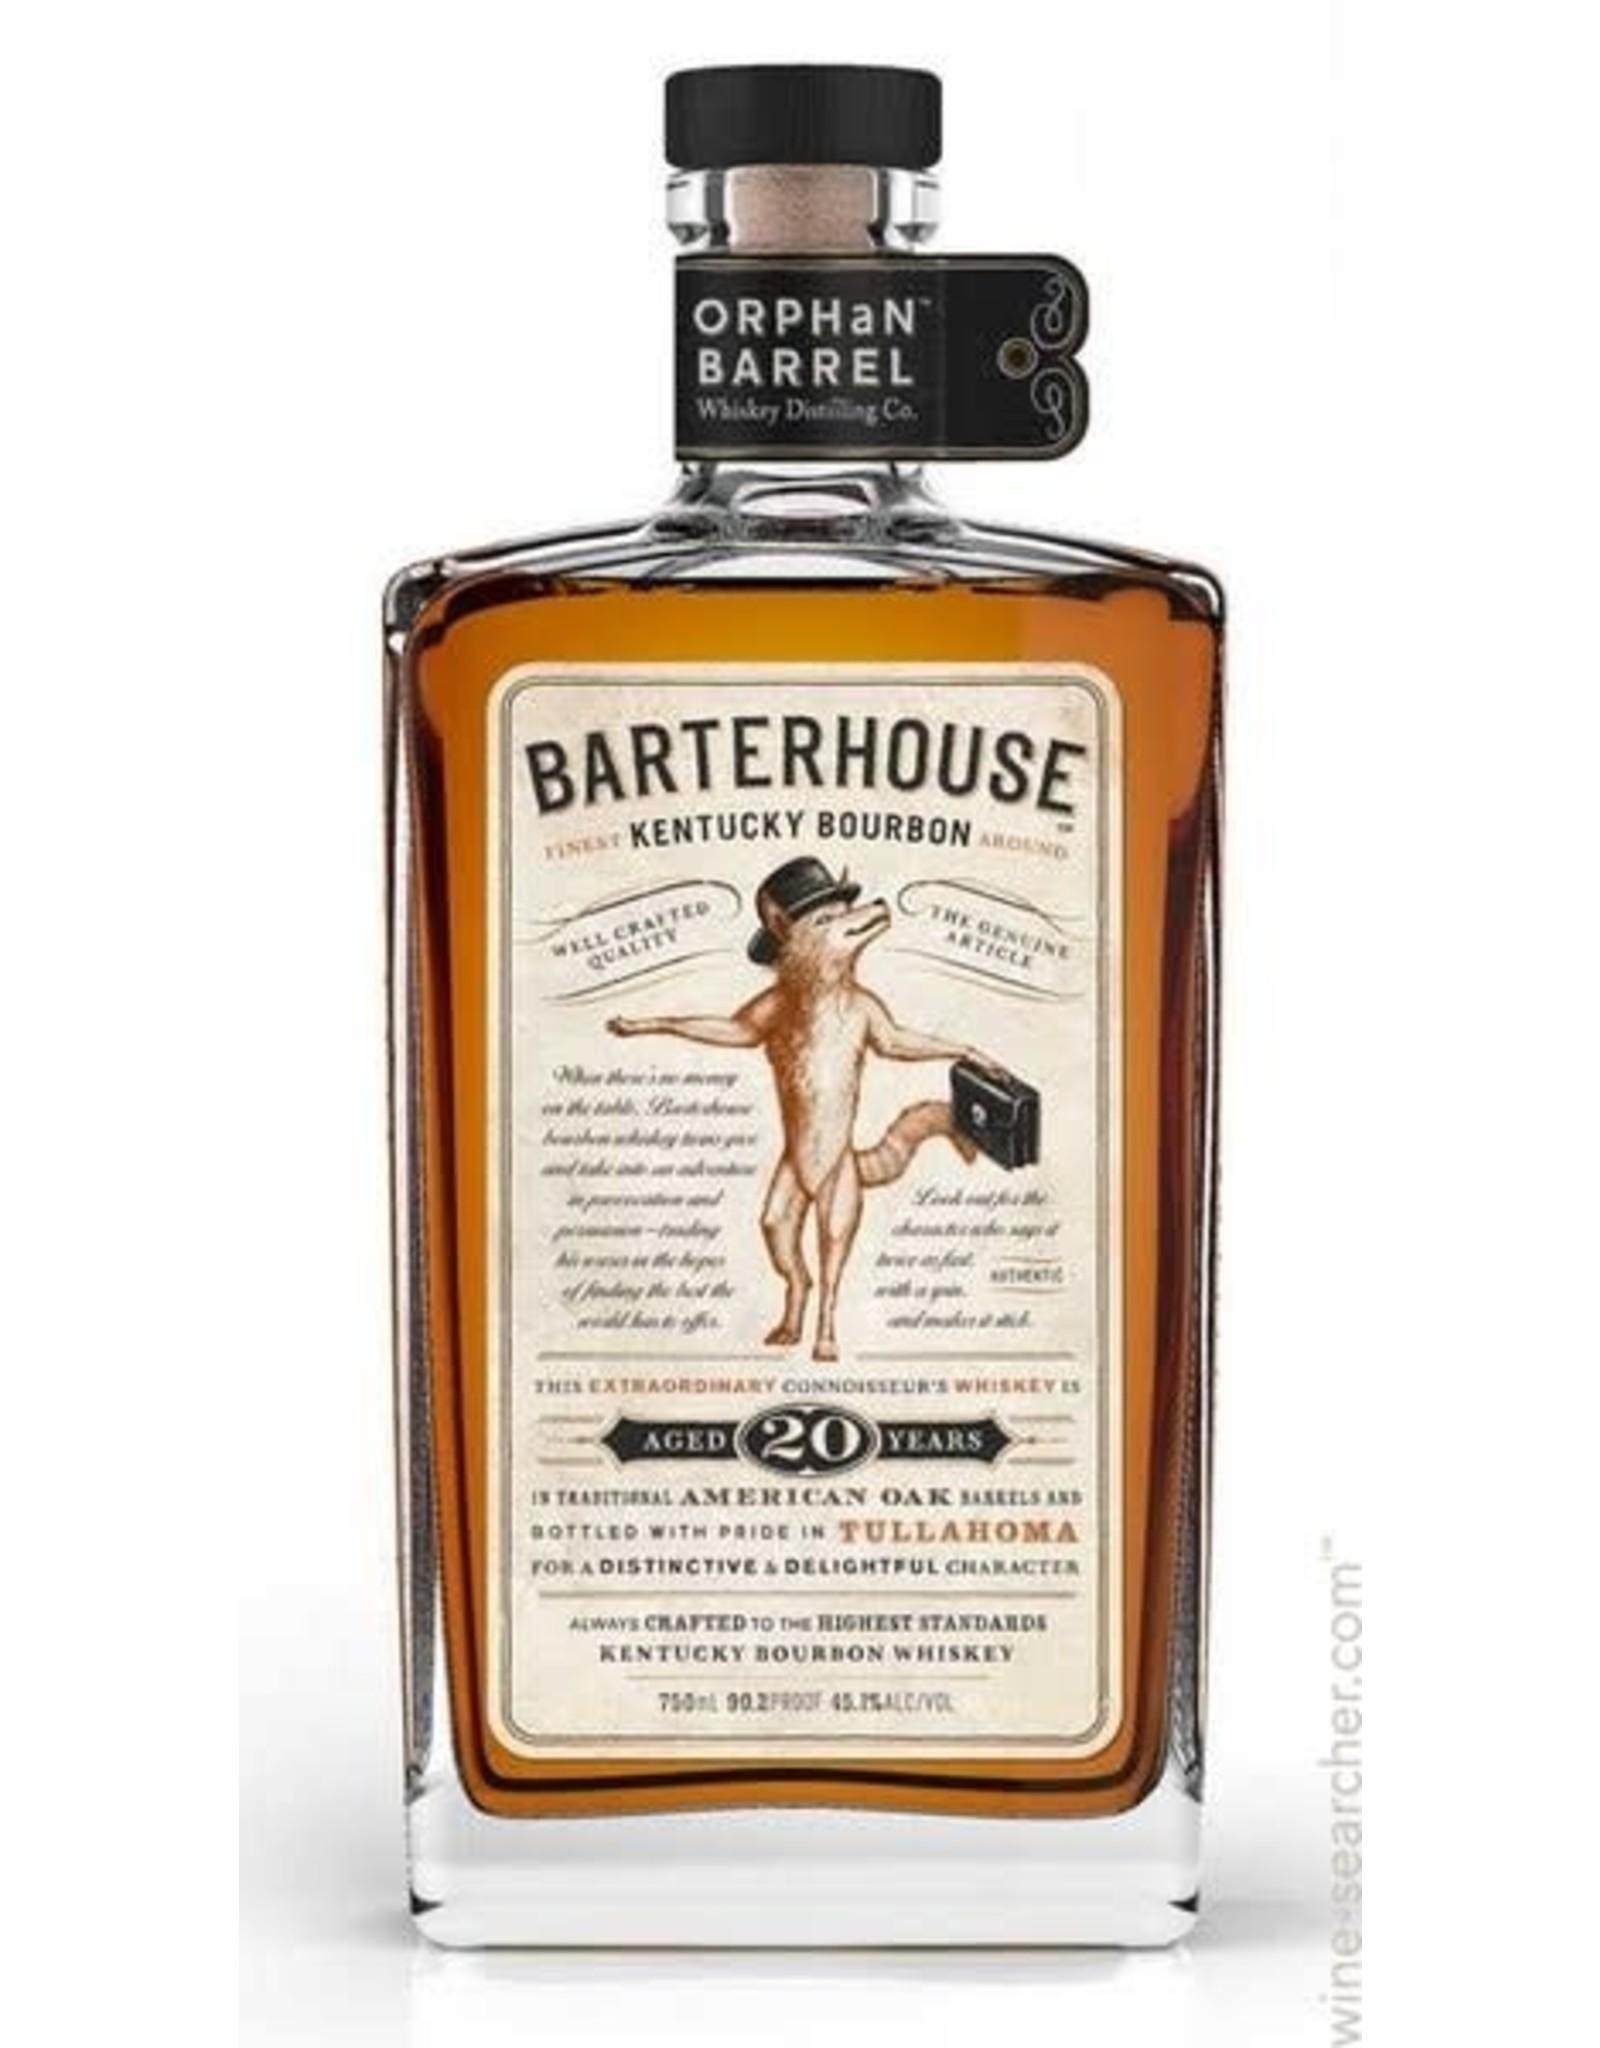 Orphan Barrel Barterhouse 20 year